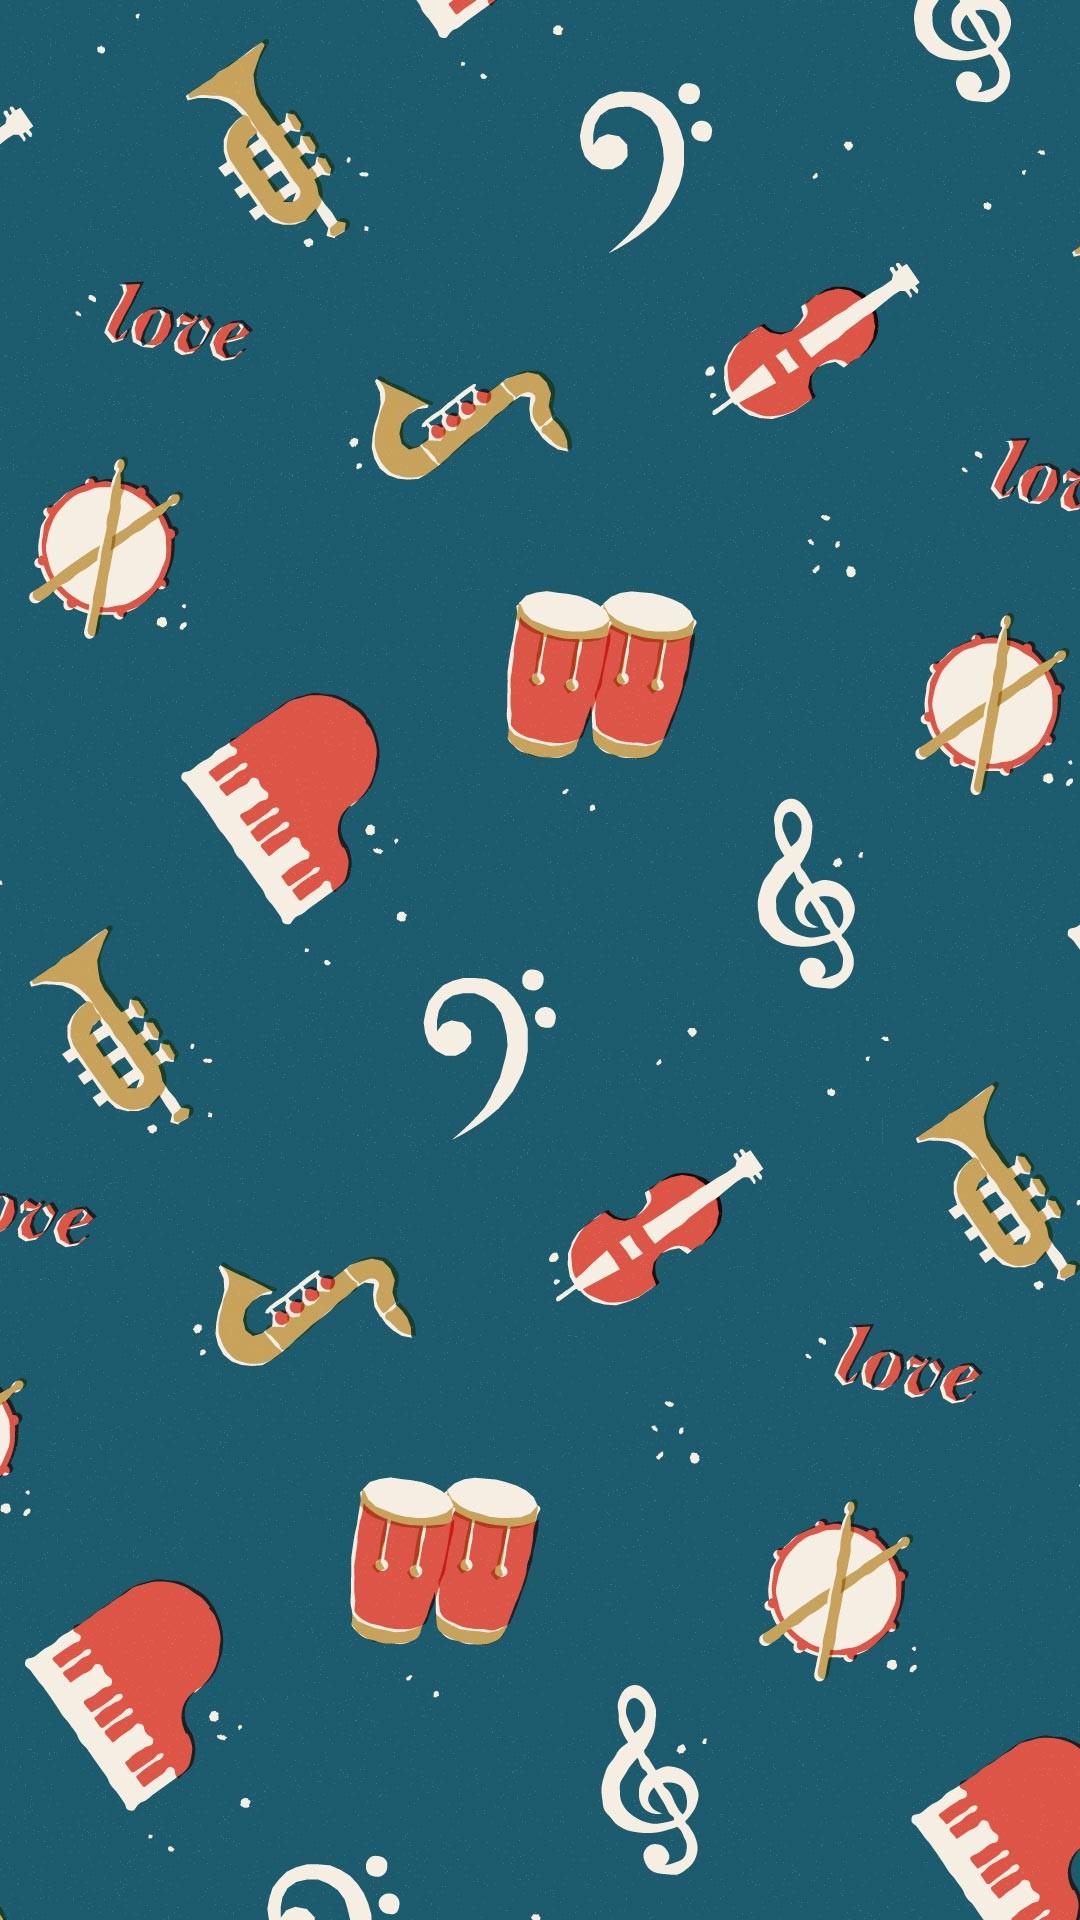 Res: 1080x1920, Jazz Phone Holiday Wallpaper